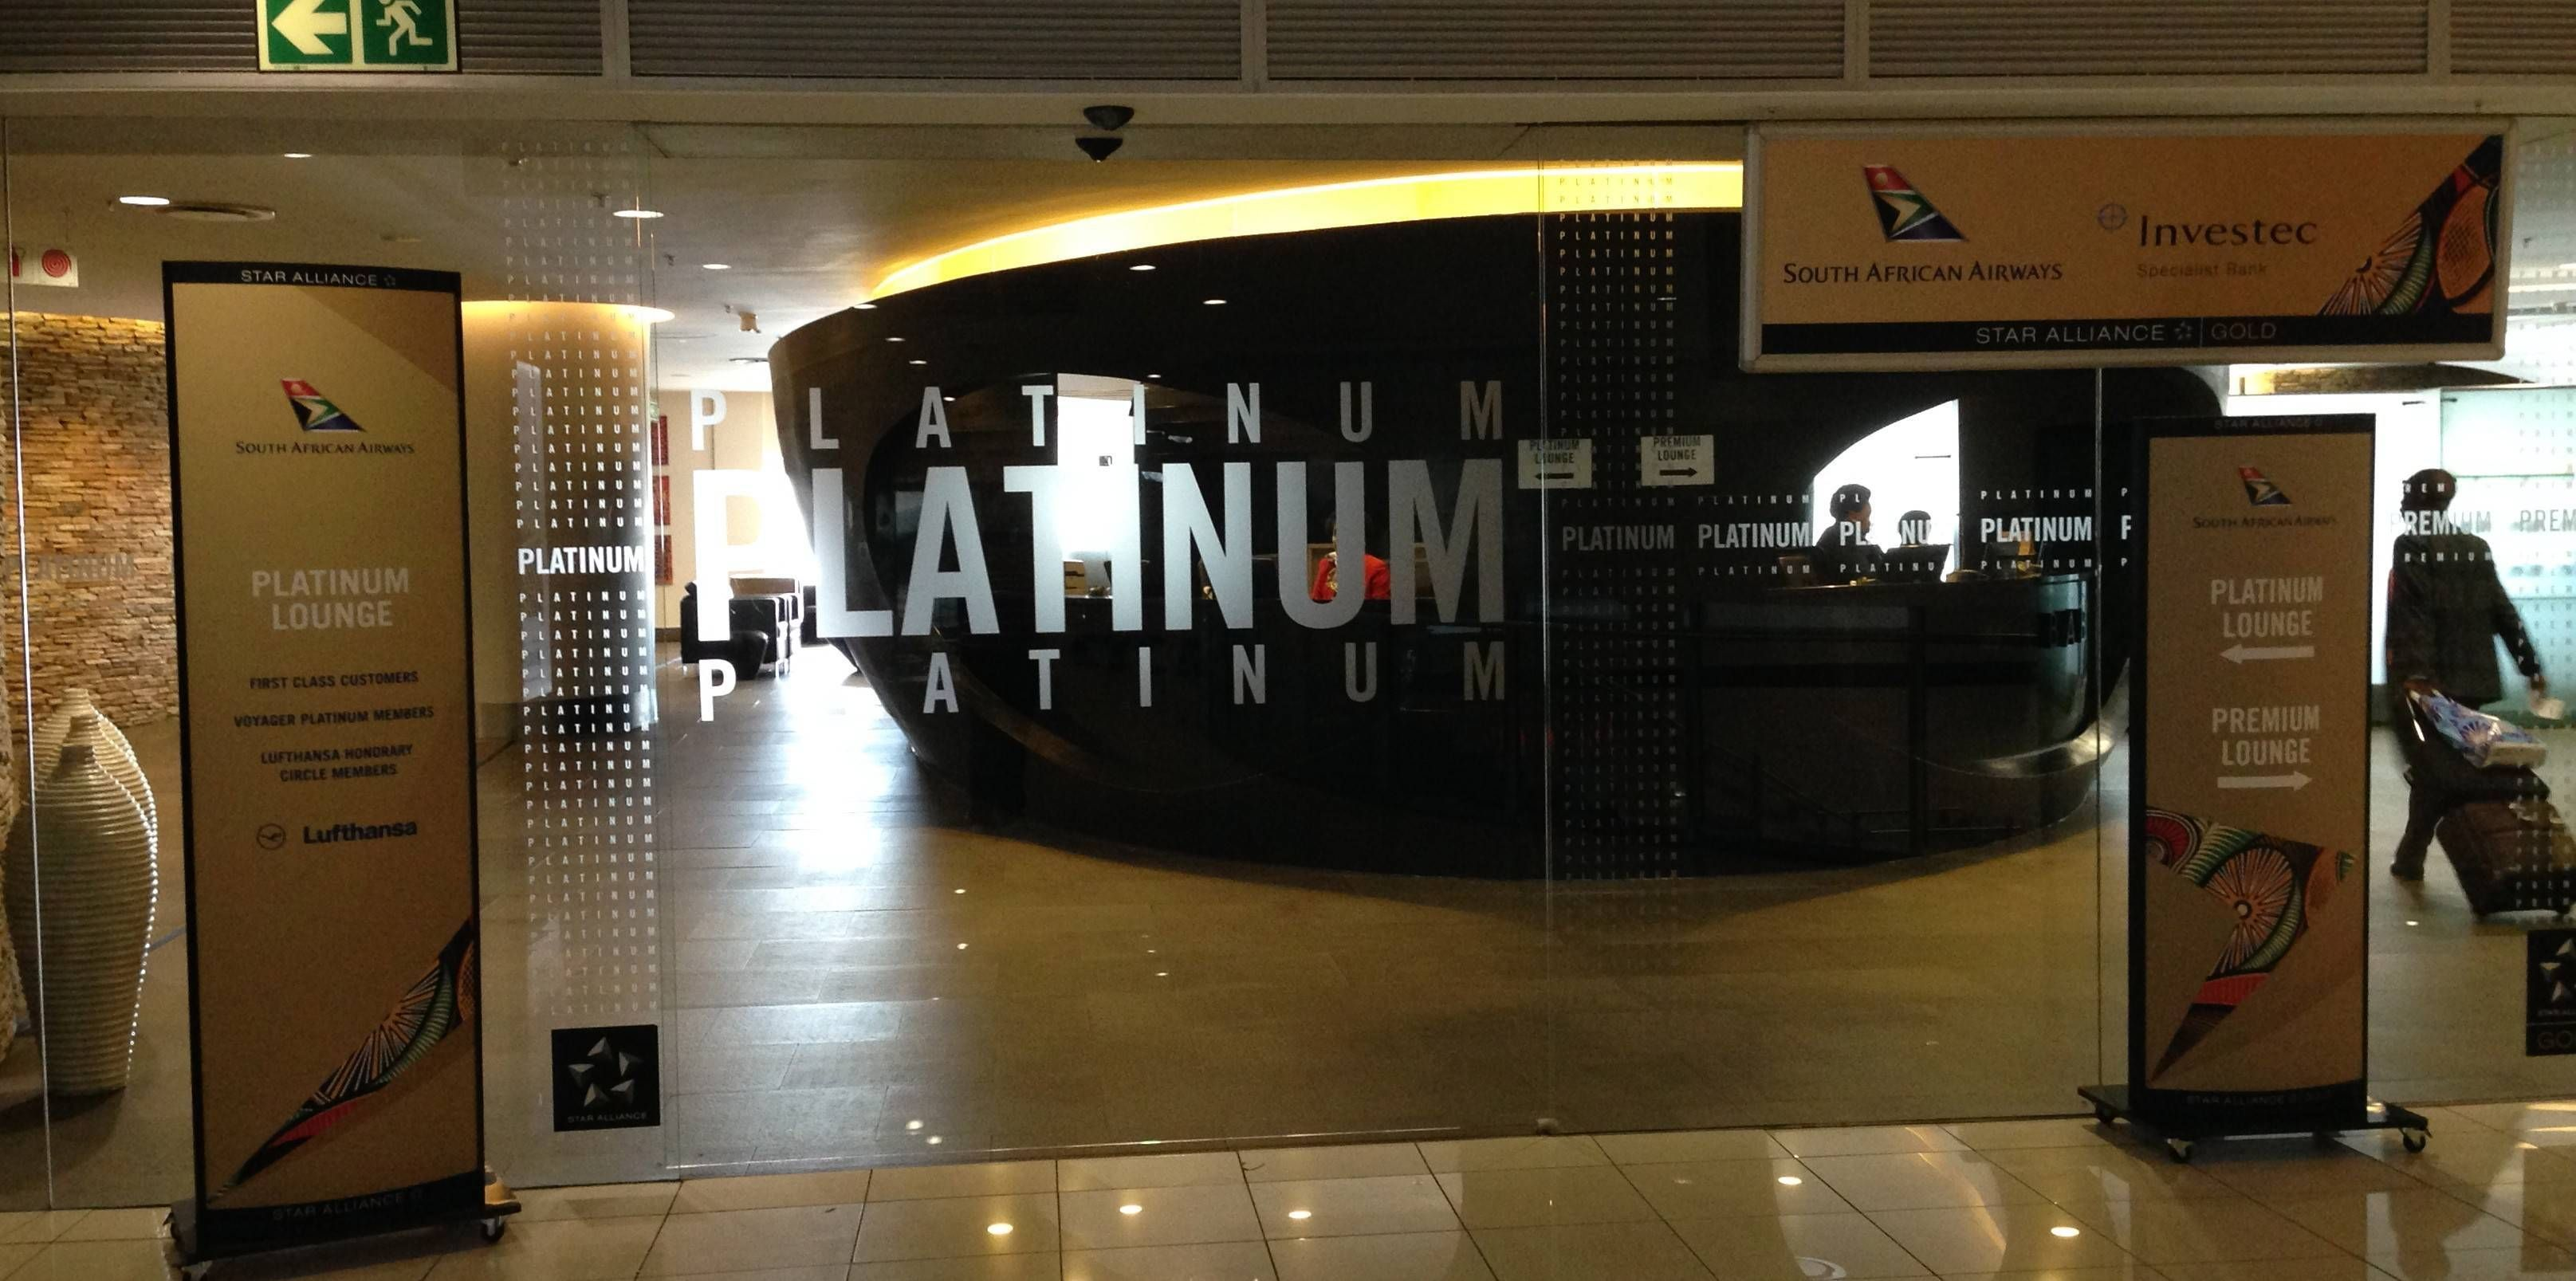 South African Airways Platinum Lounge no Aeroporto de Johannesburgo (JNB)